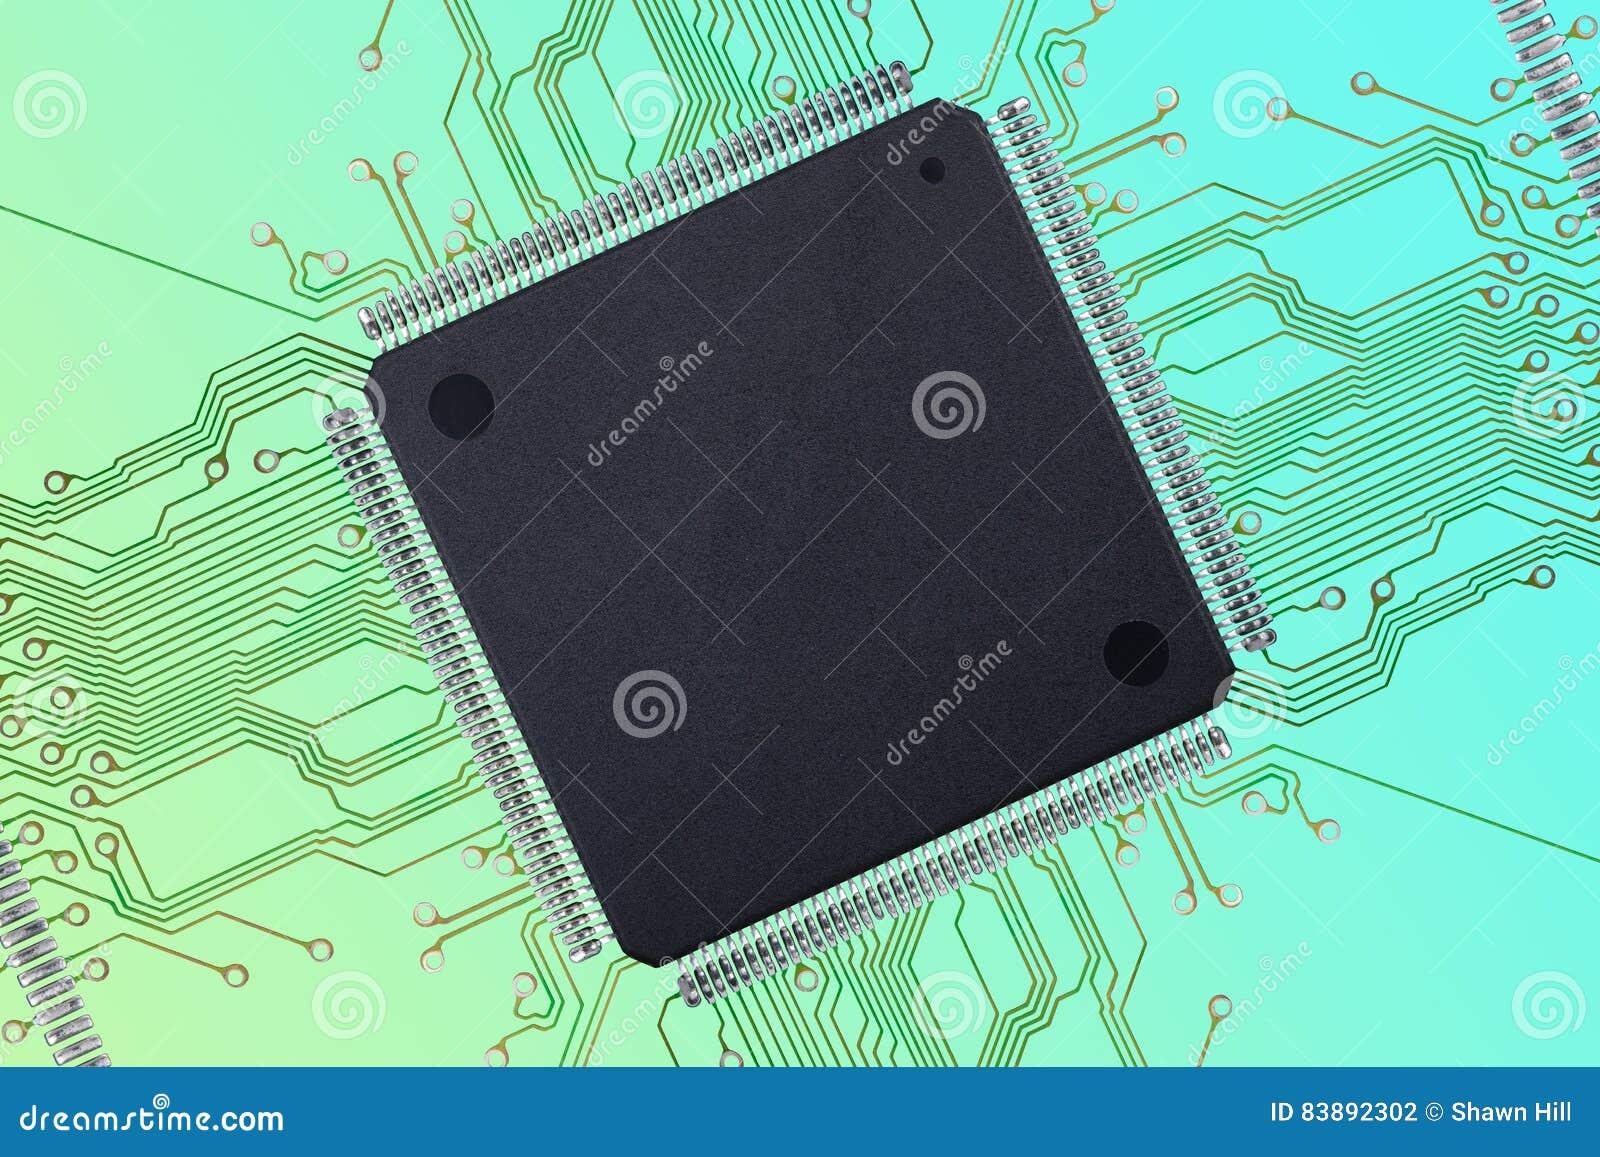 Integrated Circuit In Foam Block Royalty-Free Stock Photo